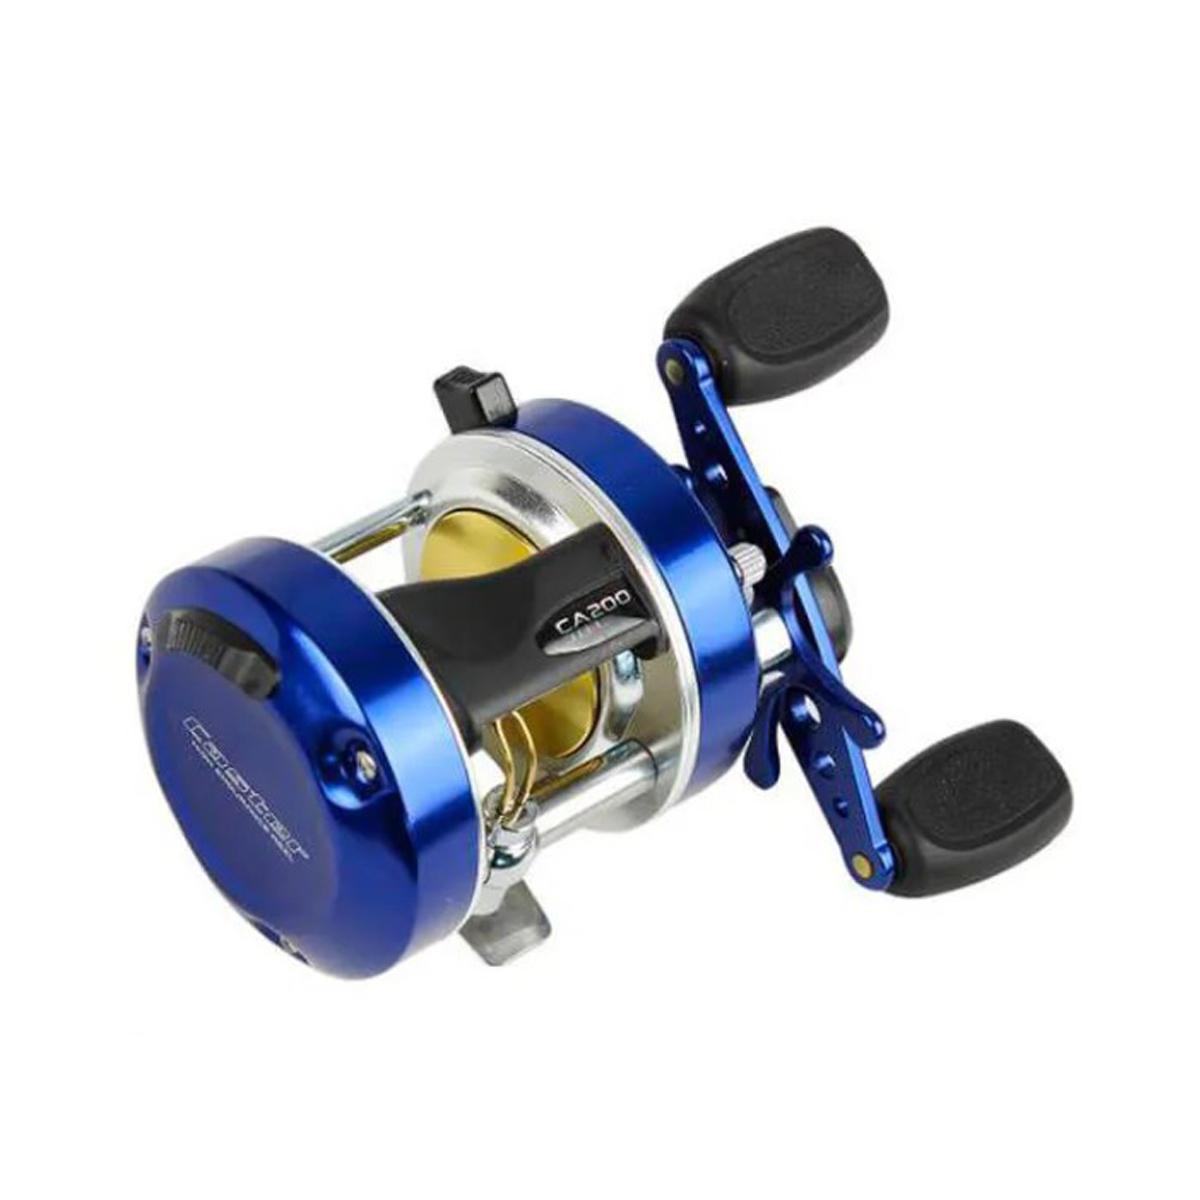 Carretilha Marine Sports Caster 3R 400  - Pró Pesca Shop